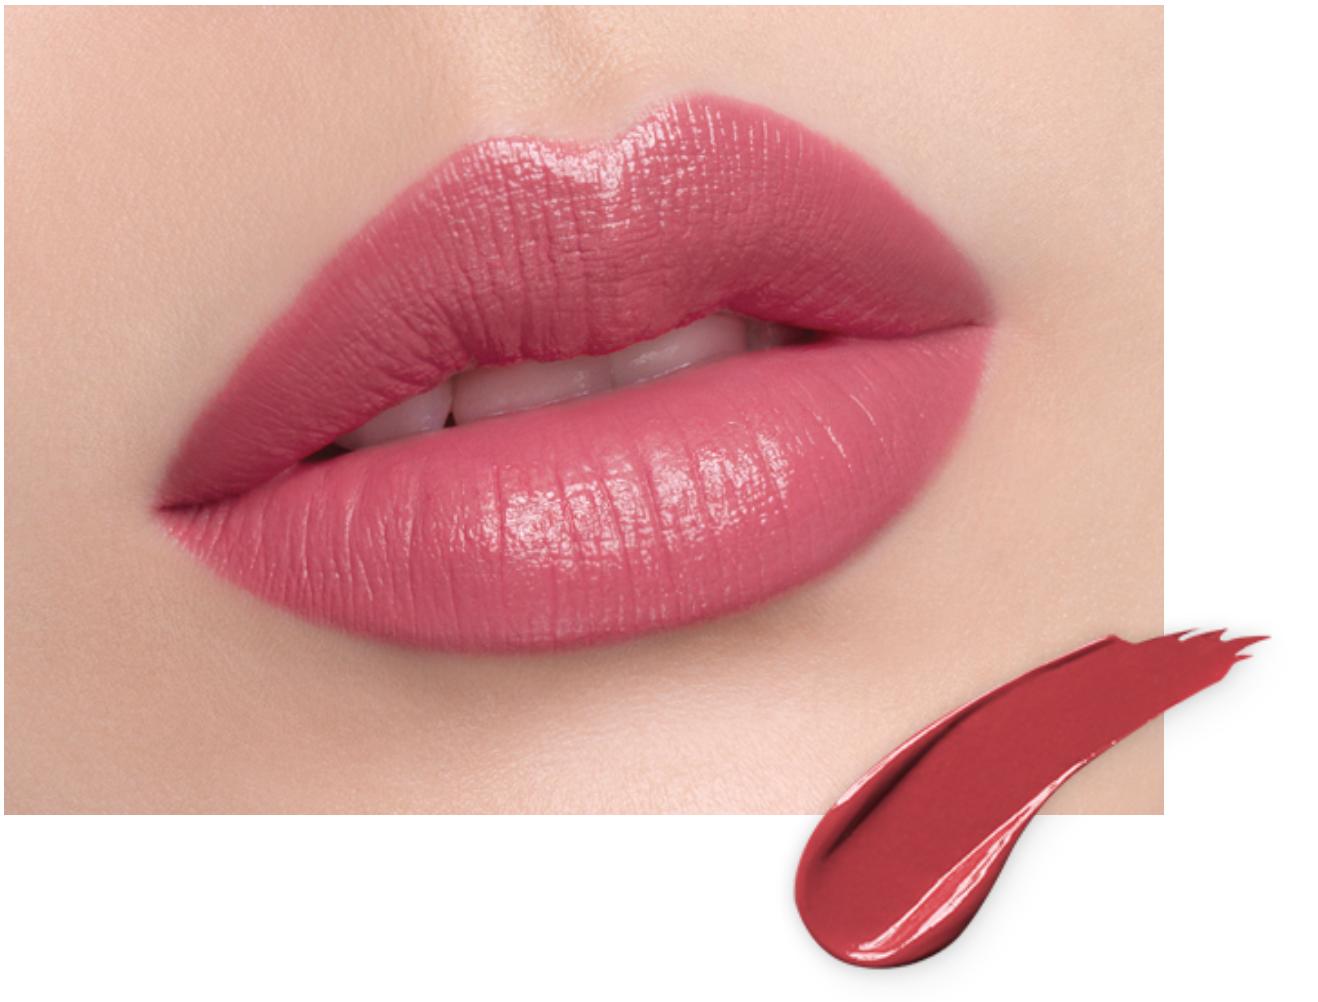 laneige-silk-intense-lipstick-465.png